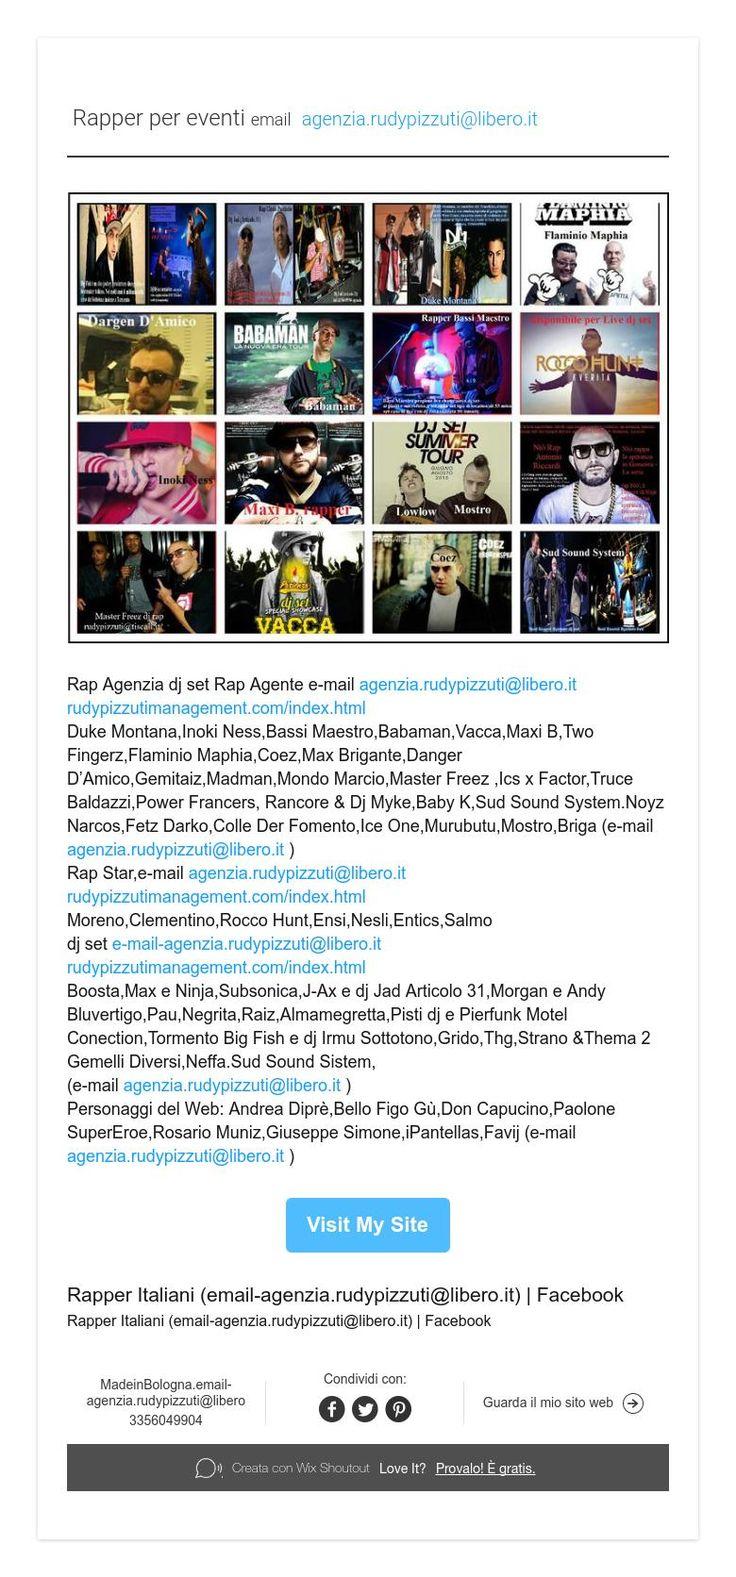 Rapper per eventi emailagenzia.rudypizzuti@libero.it